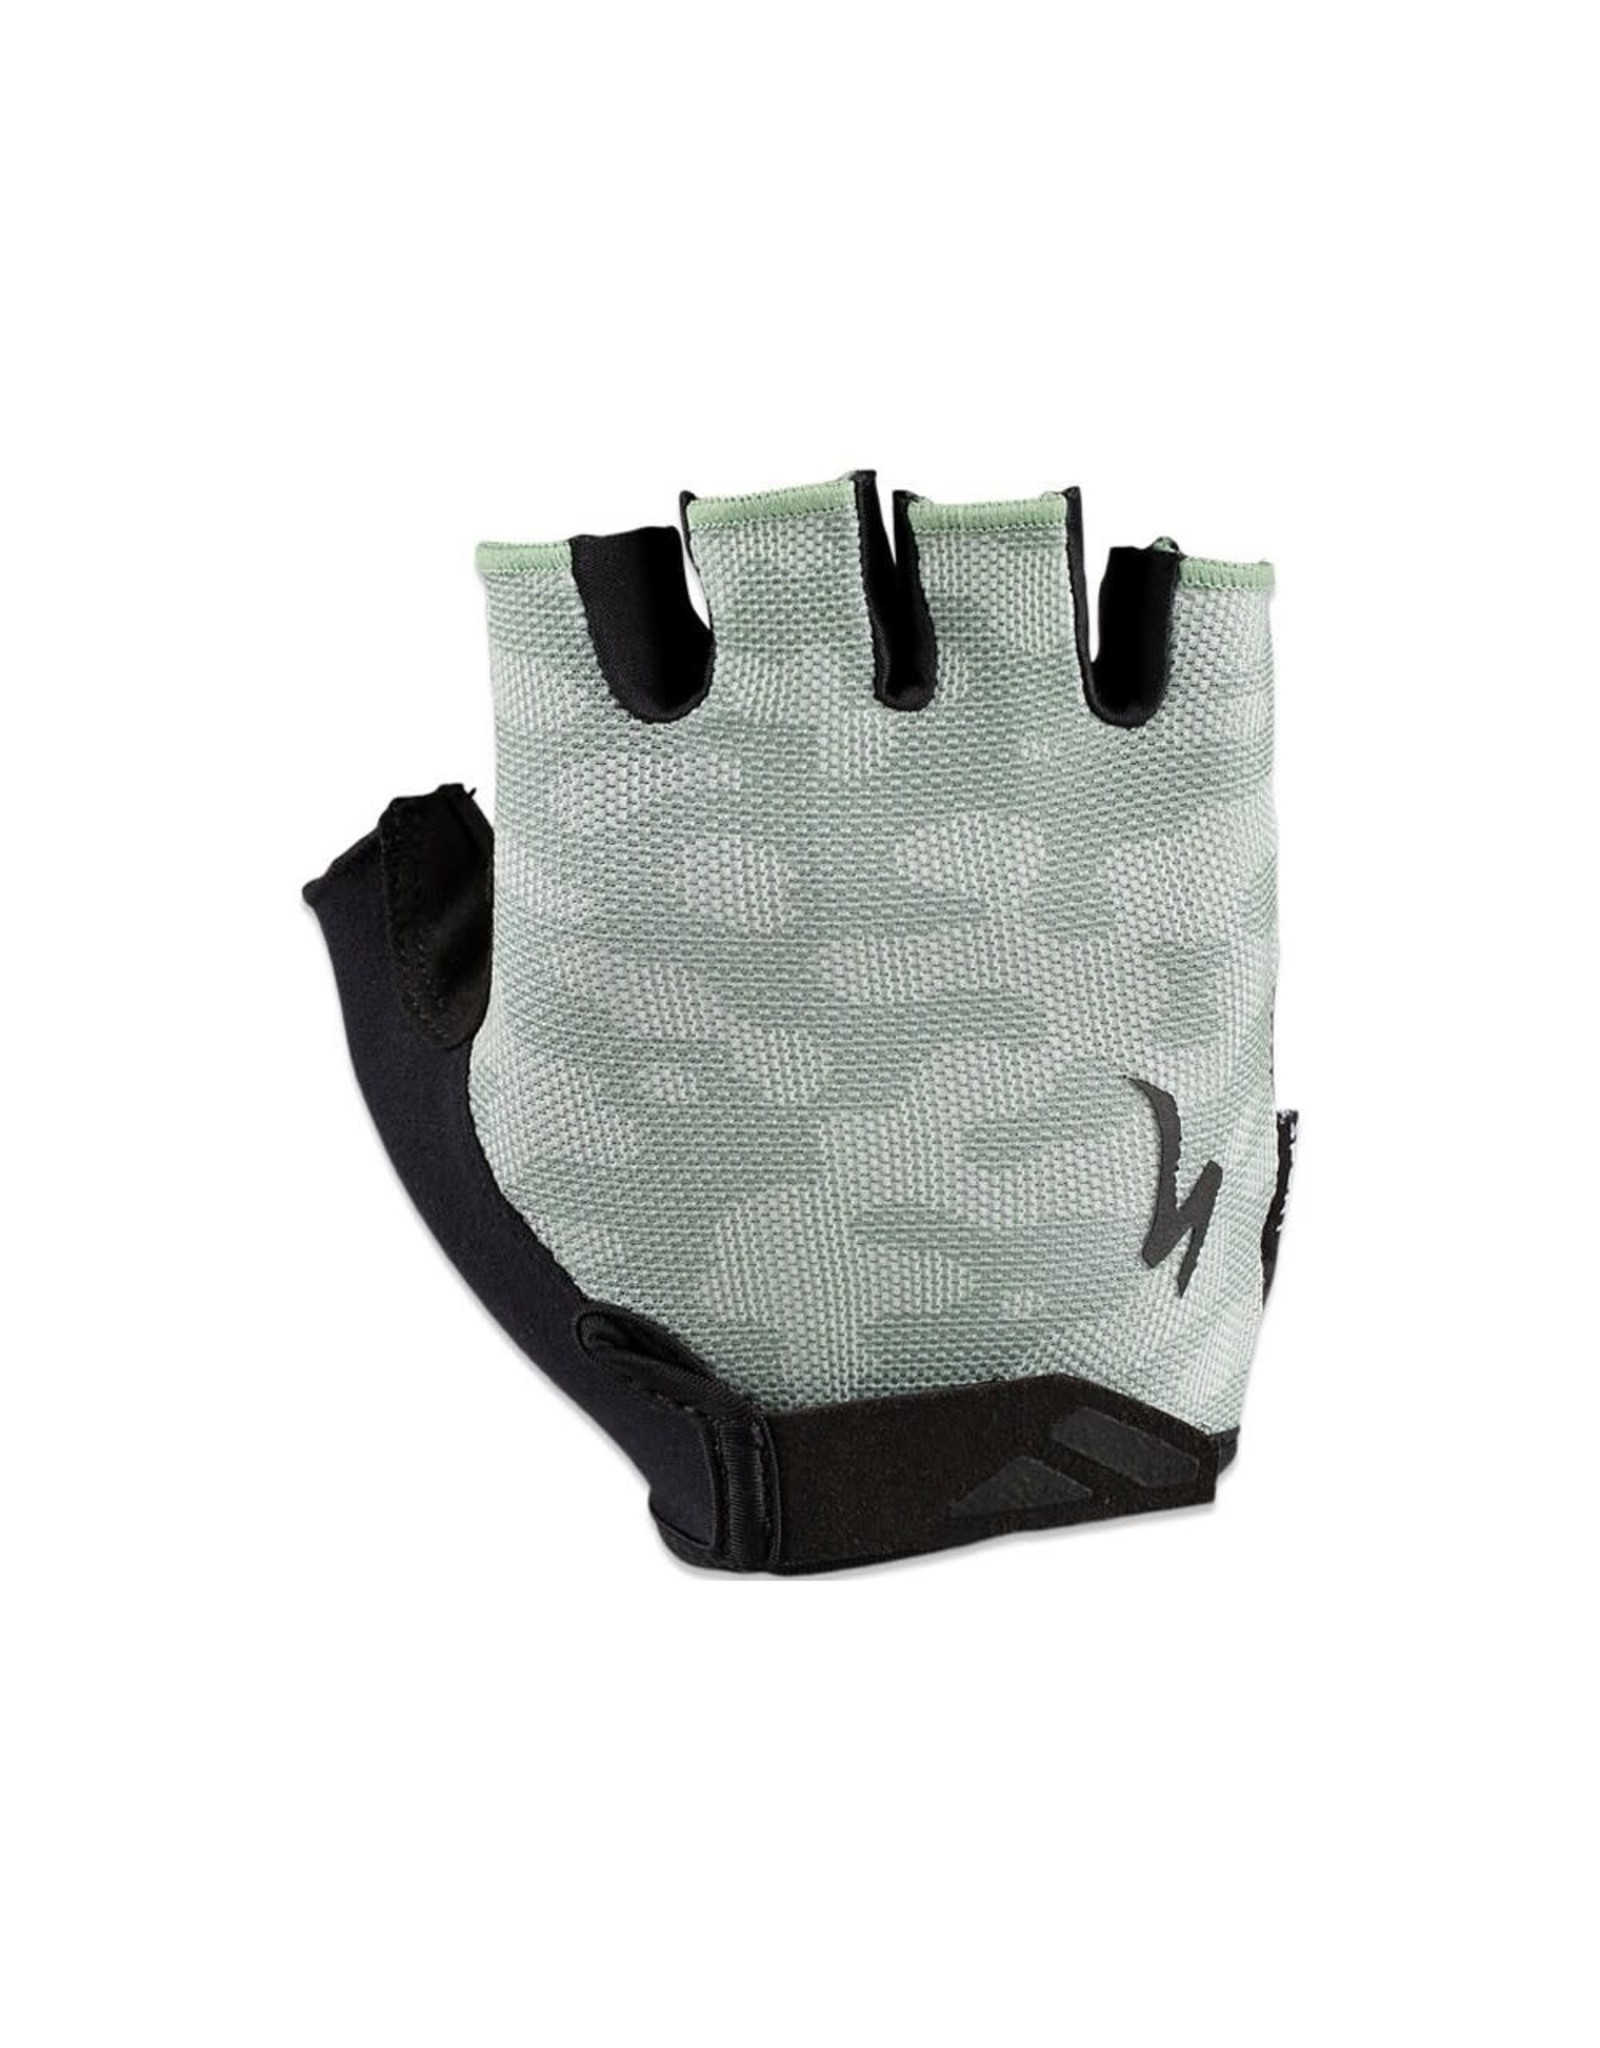 Specialized Glove Spec Sport SgeGrn/Spr Large